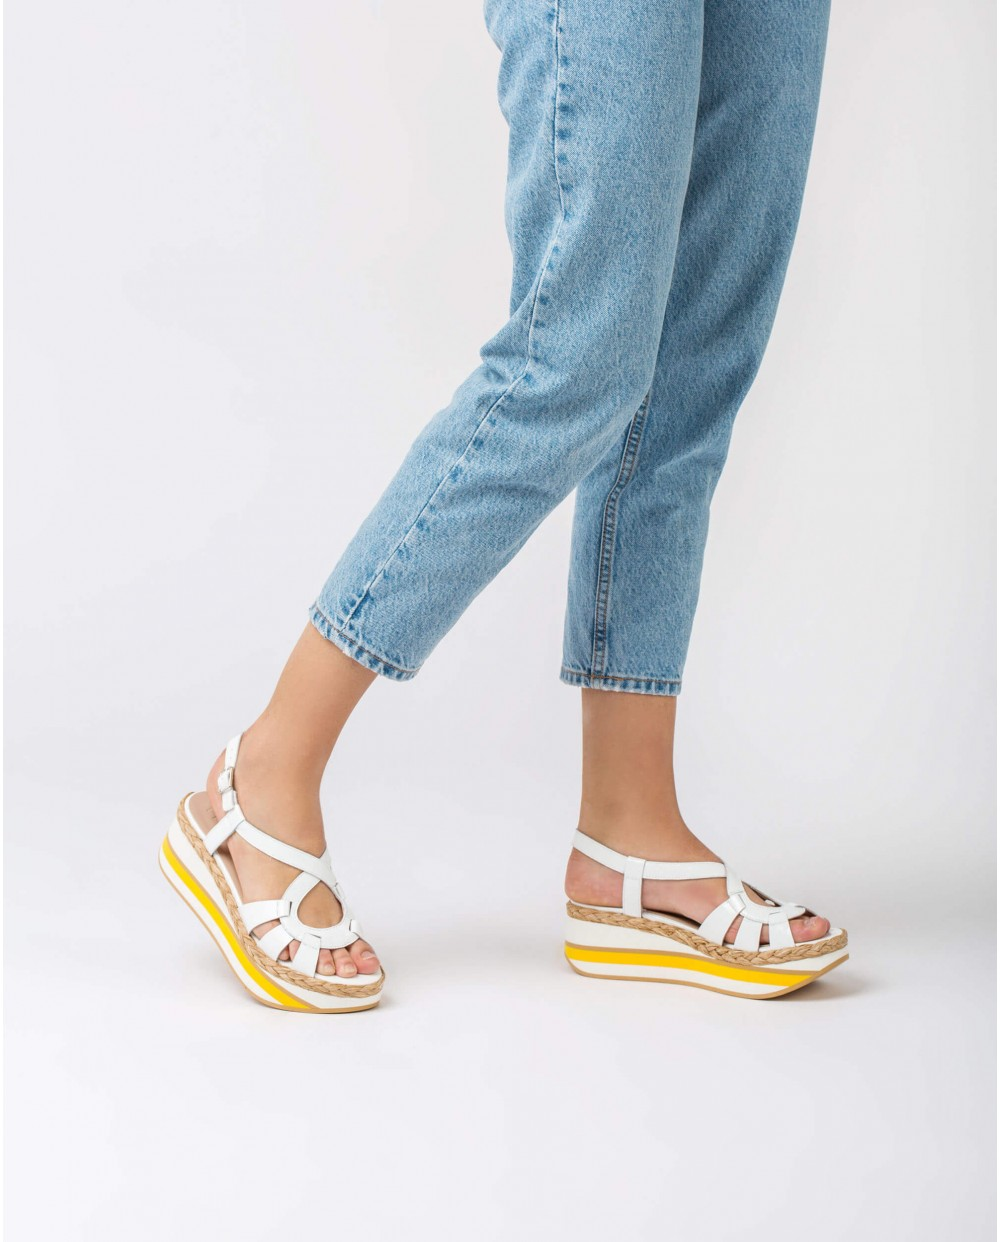 Wonders-Sandals-Sandal with jute plat